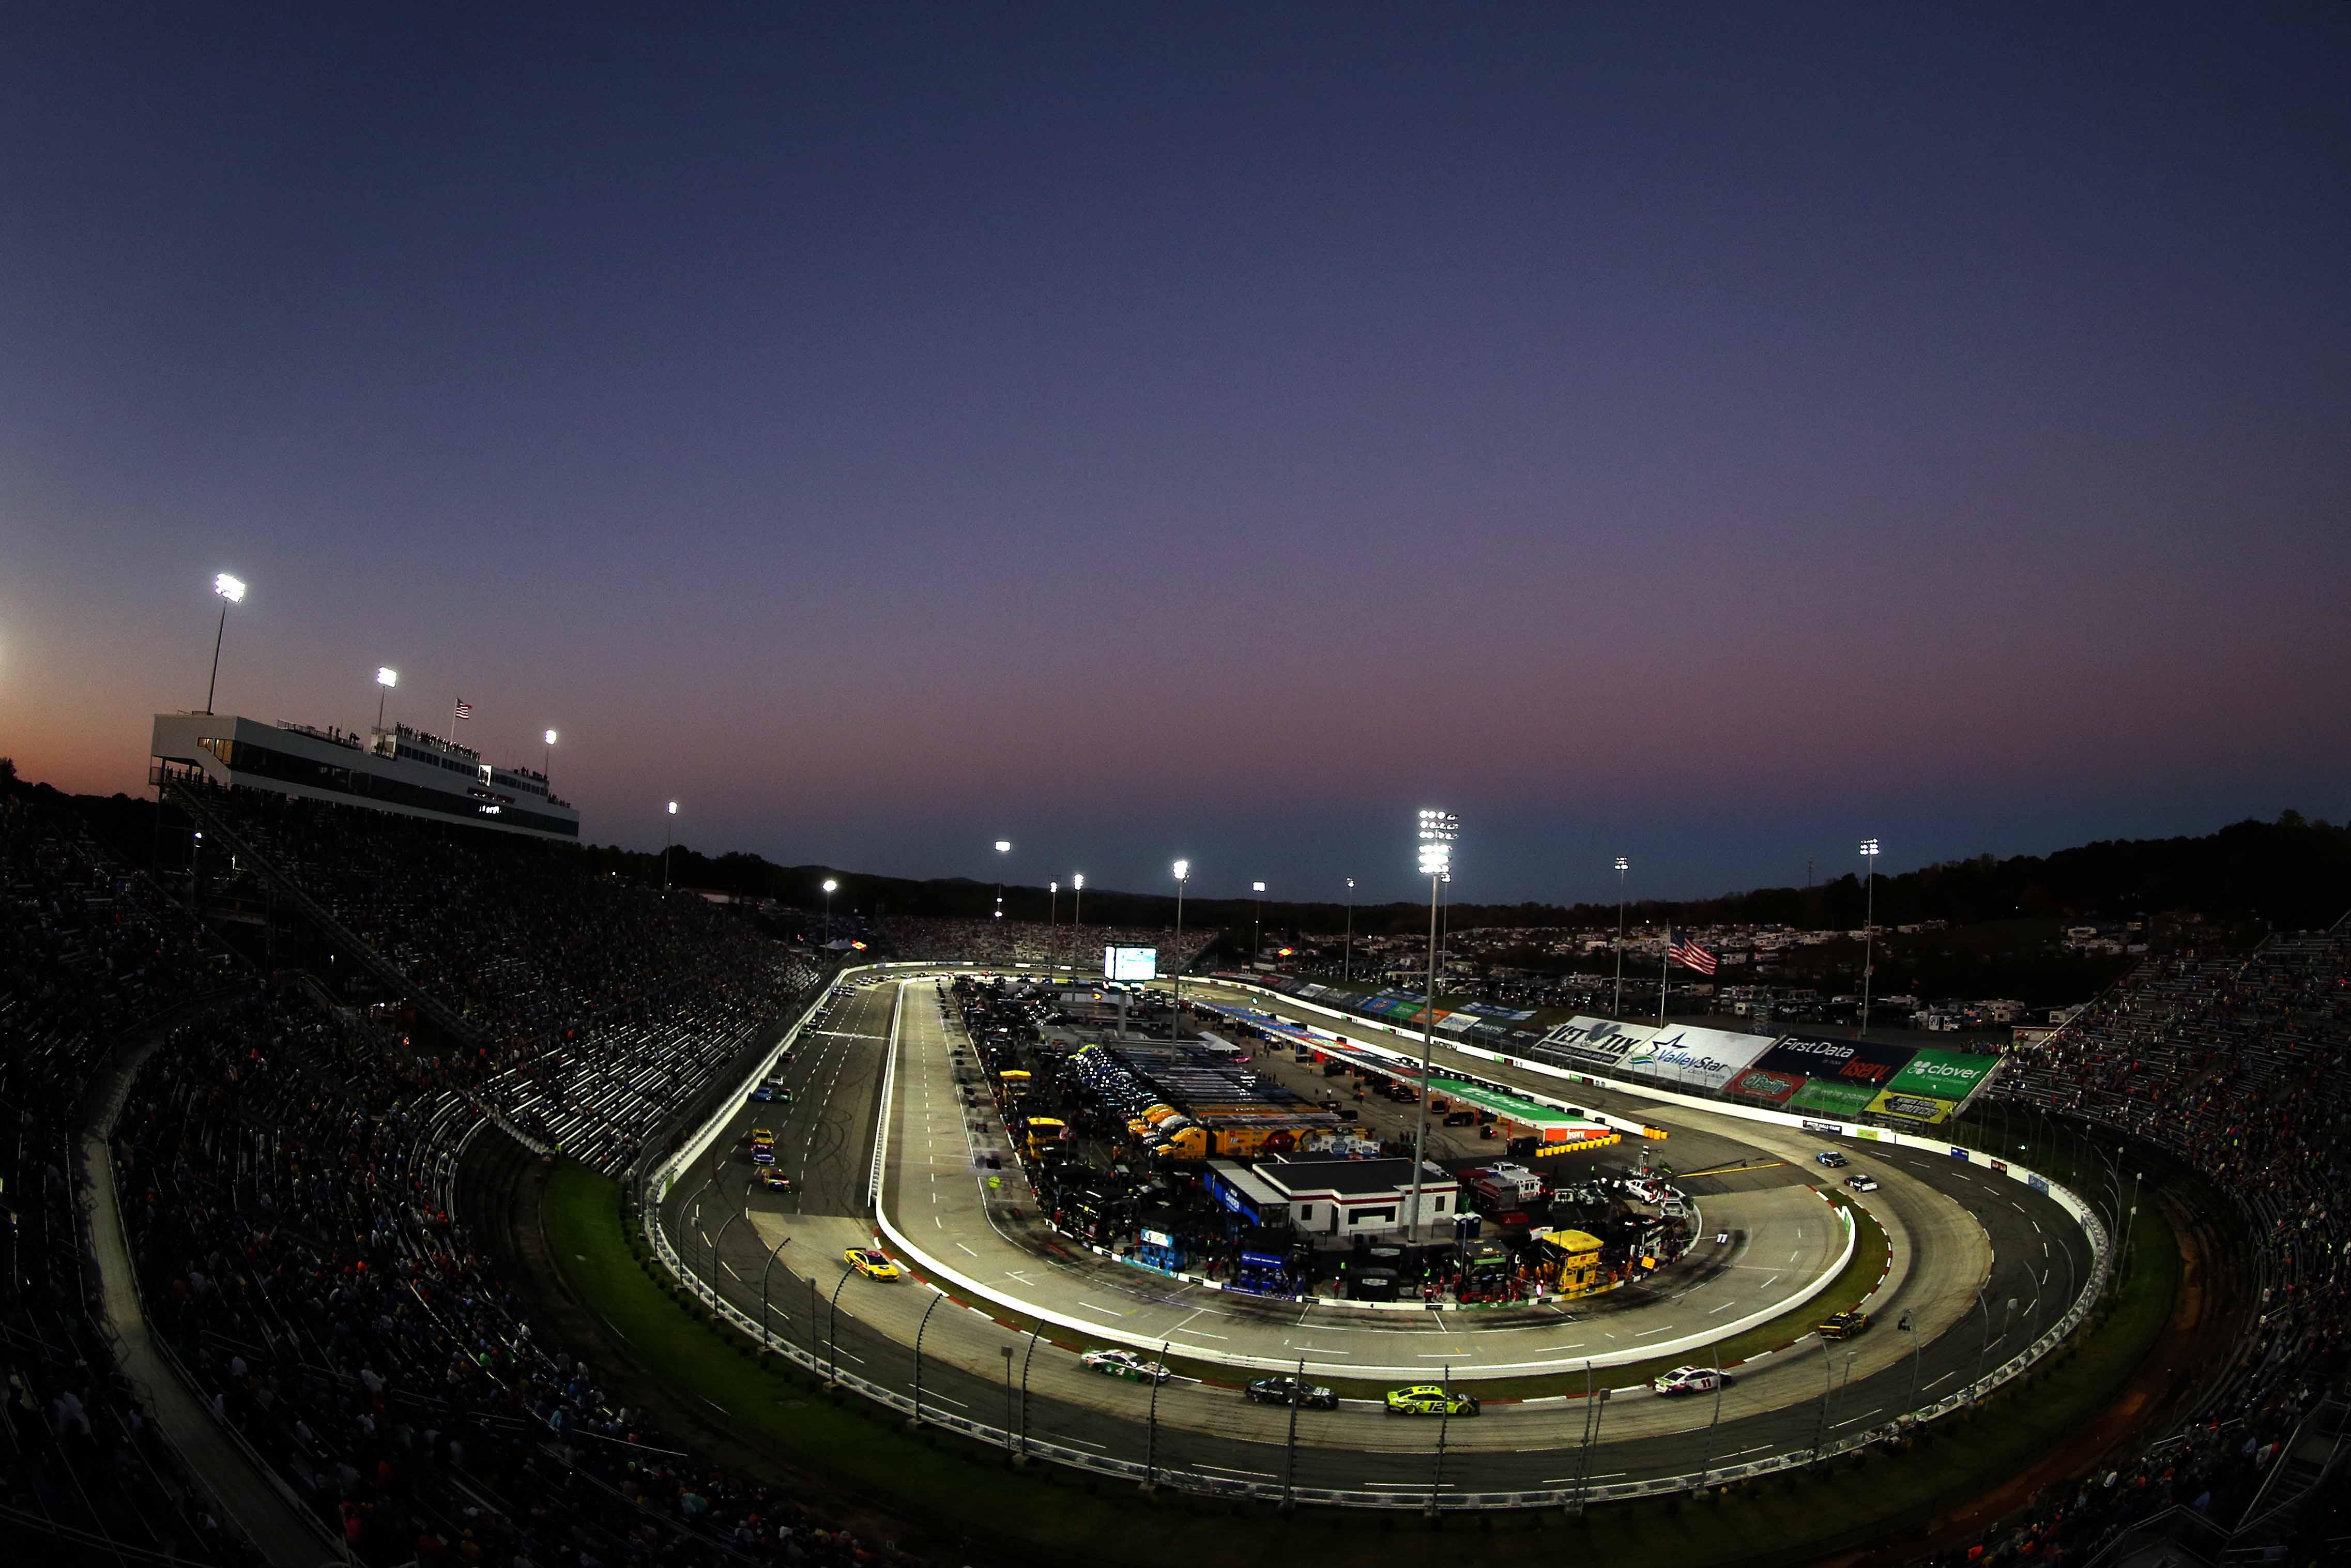 Night racing at Martinsville Speedway